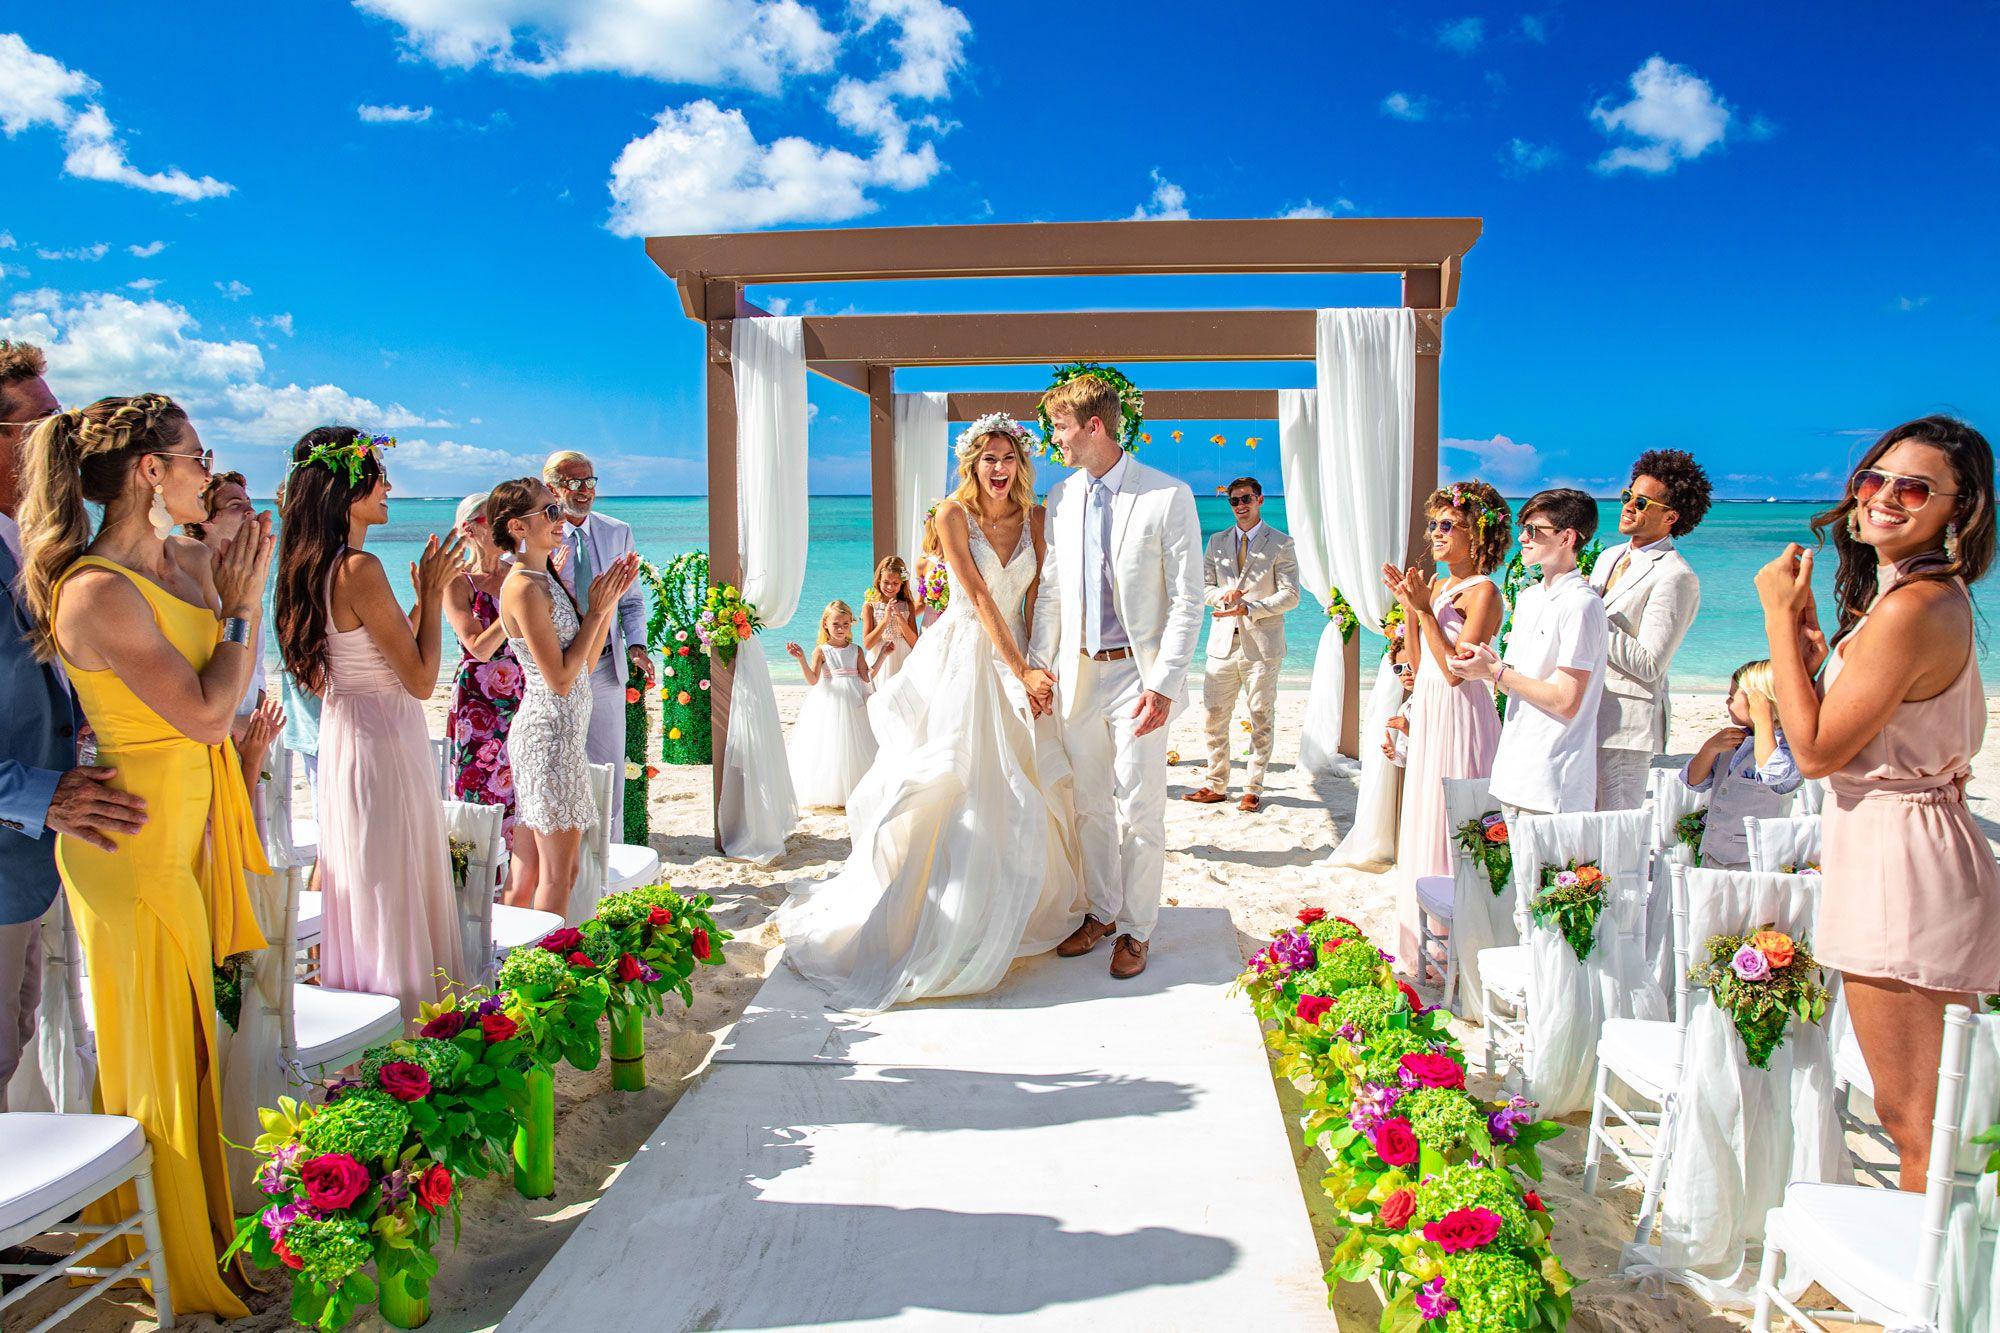 https://www.beaches.com/blog/content/images/2019/11/Beaches-Turks-Caicos-Beach-Wedding6.jpg